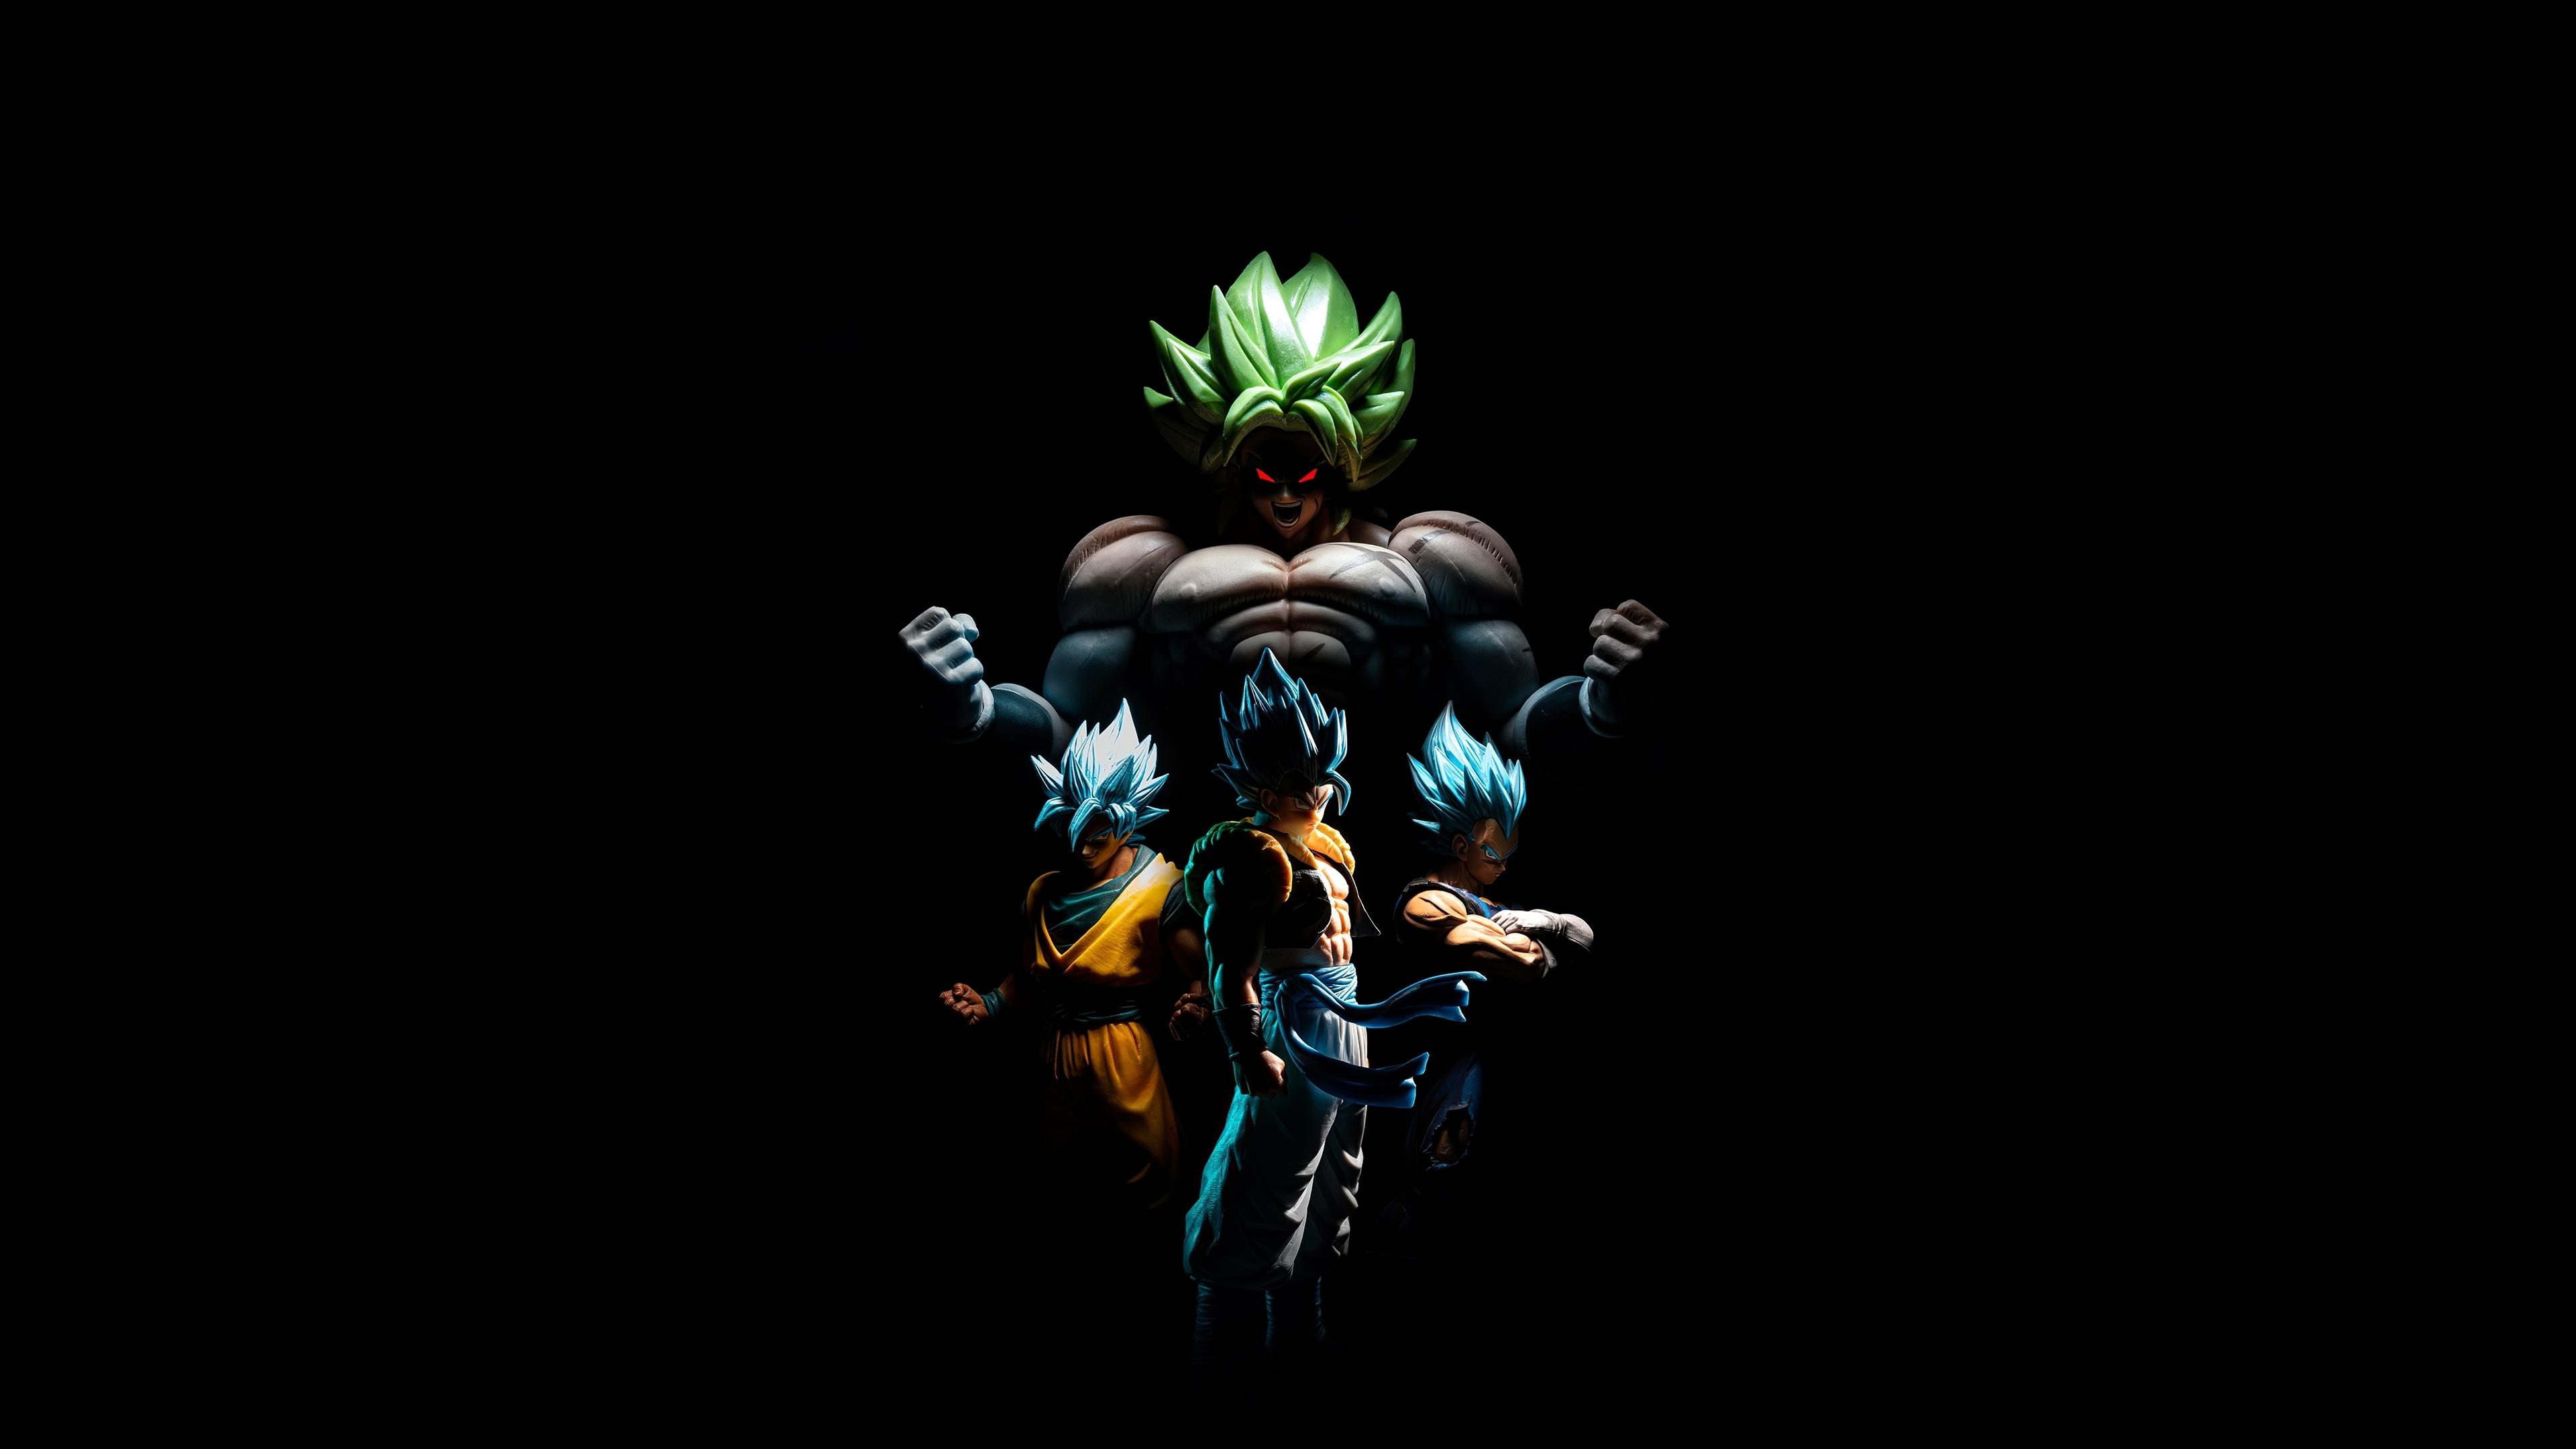 Download 3840x2160 Wallpaper Goku And Broly Vegeta Gogeta Dark 4k Uhd 16 9 Widescreen 3840x2160 Hd Image Background 24844